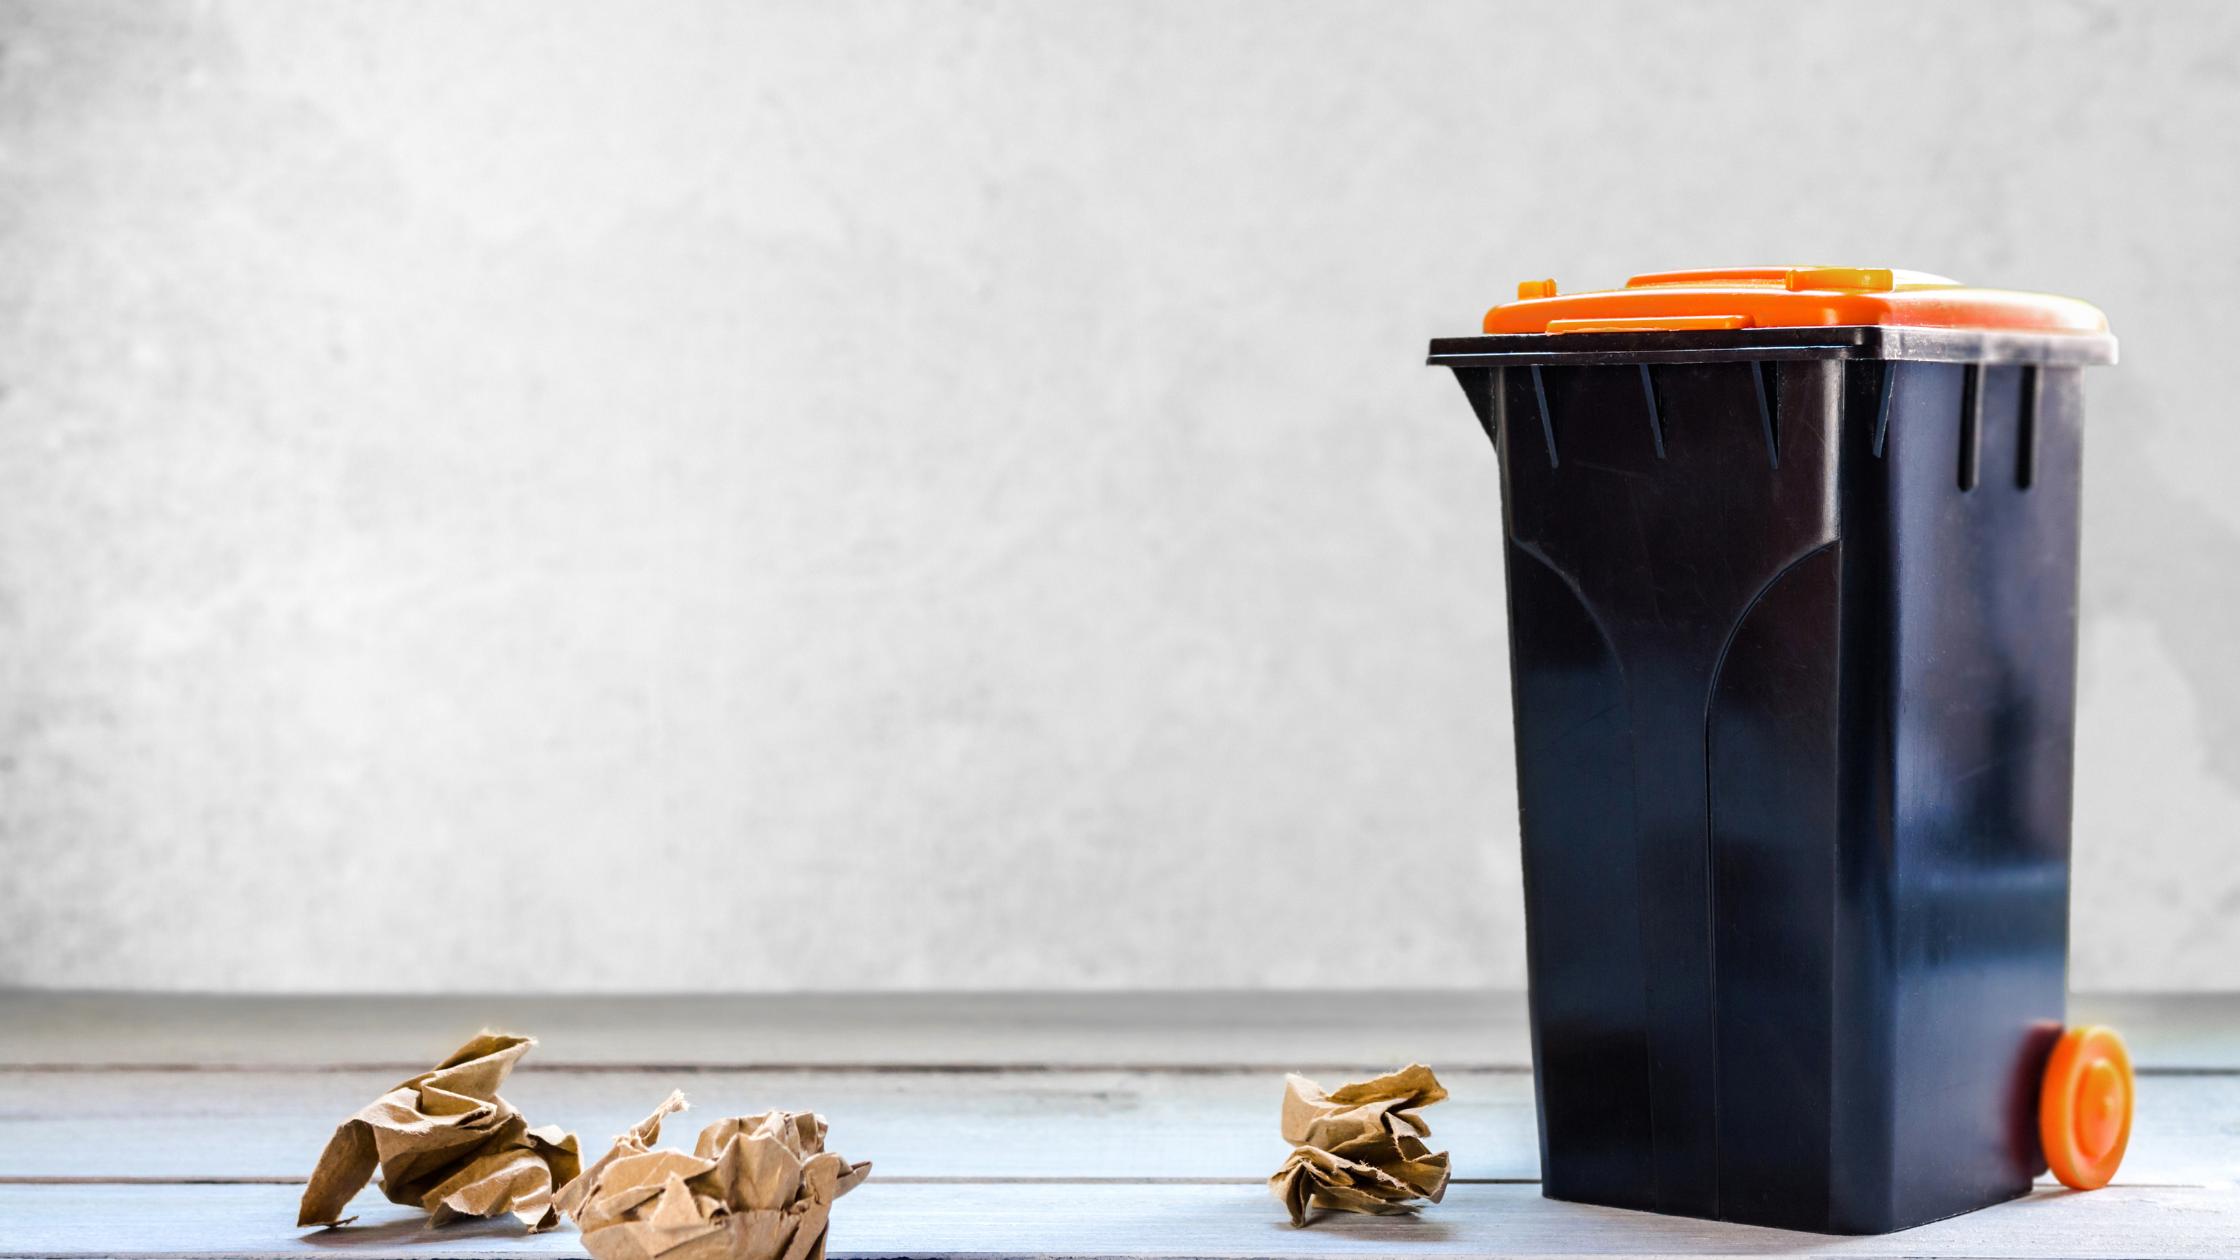 decreto-116-2020-gestione-rifiuti